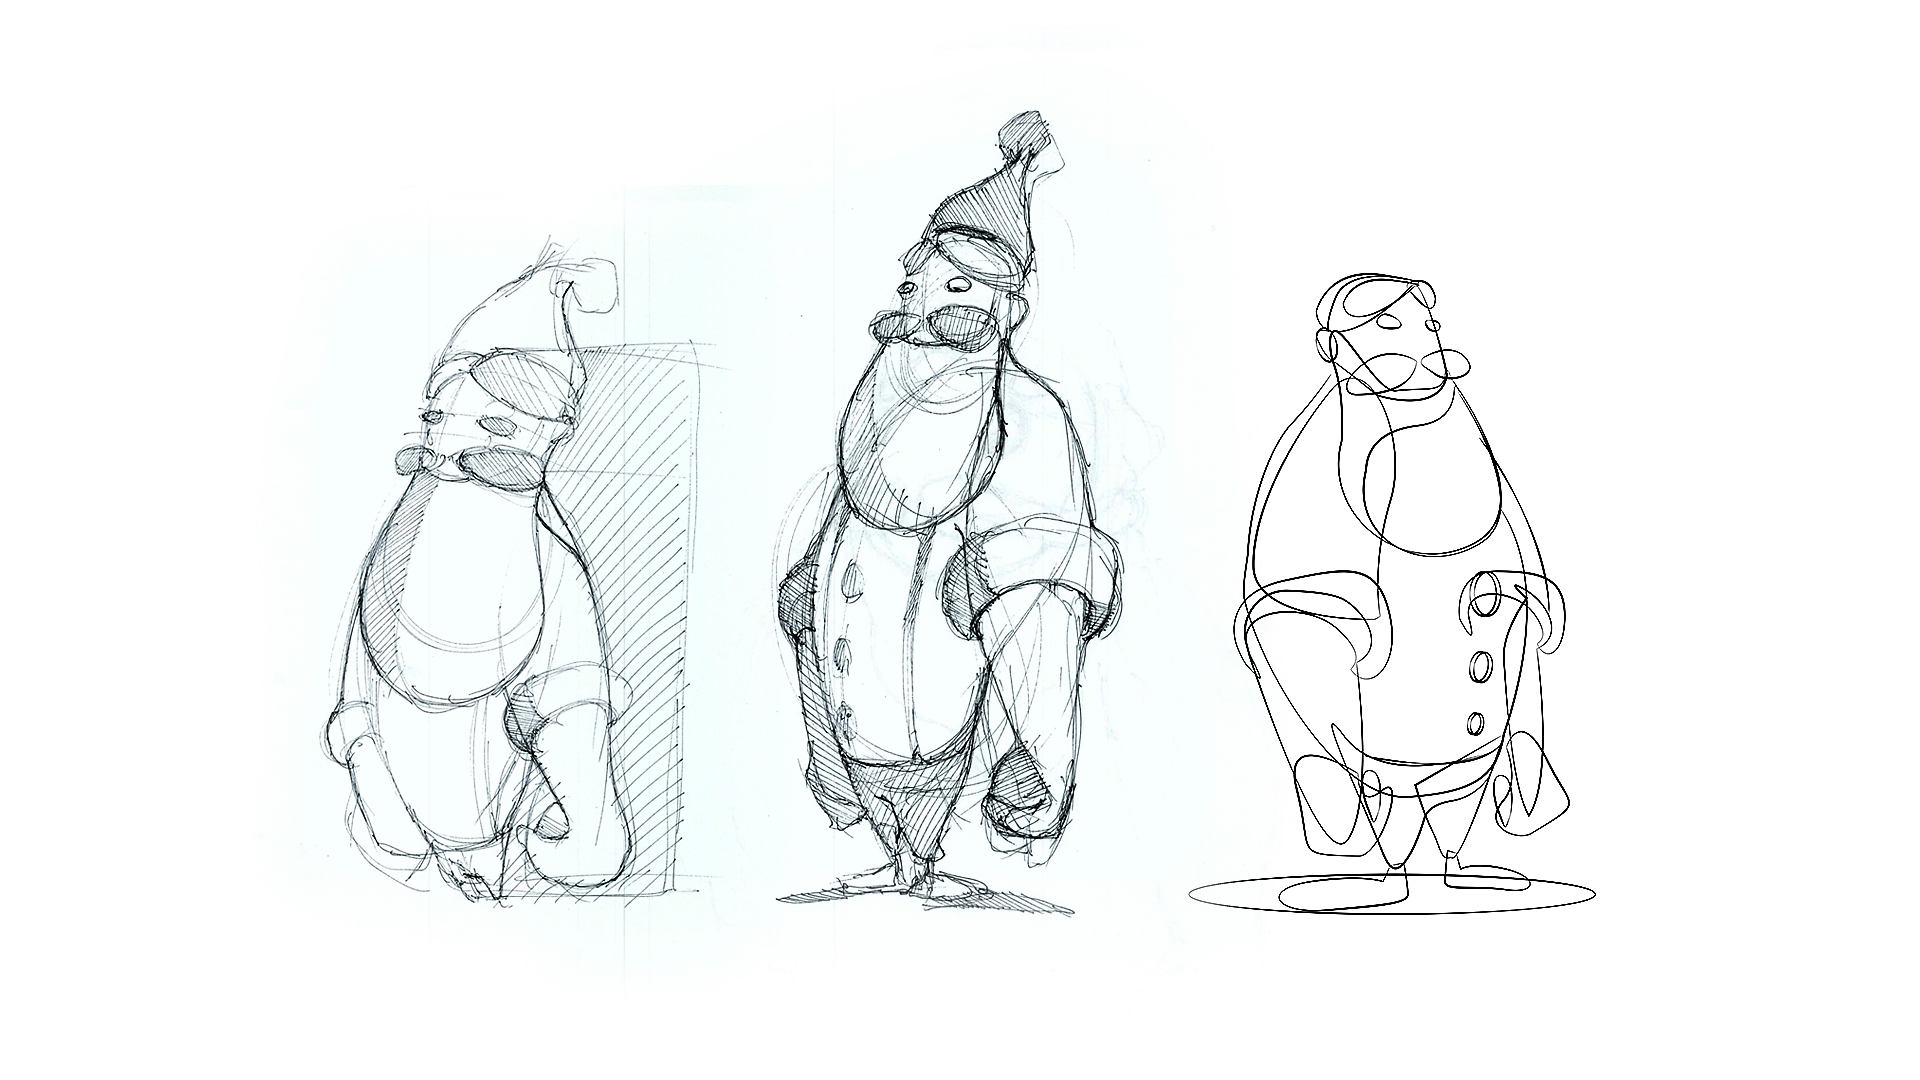 Character Design sketch of various Santa Claus